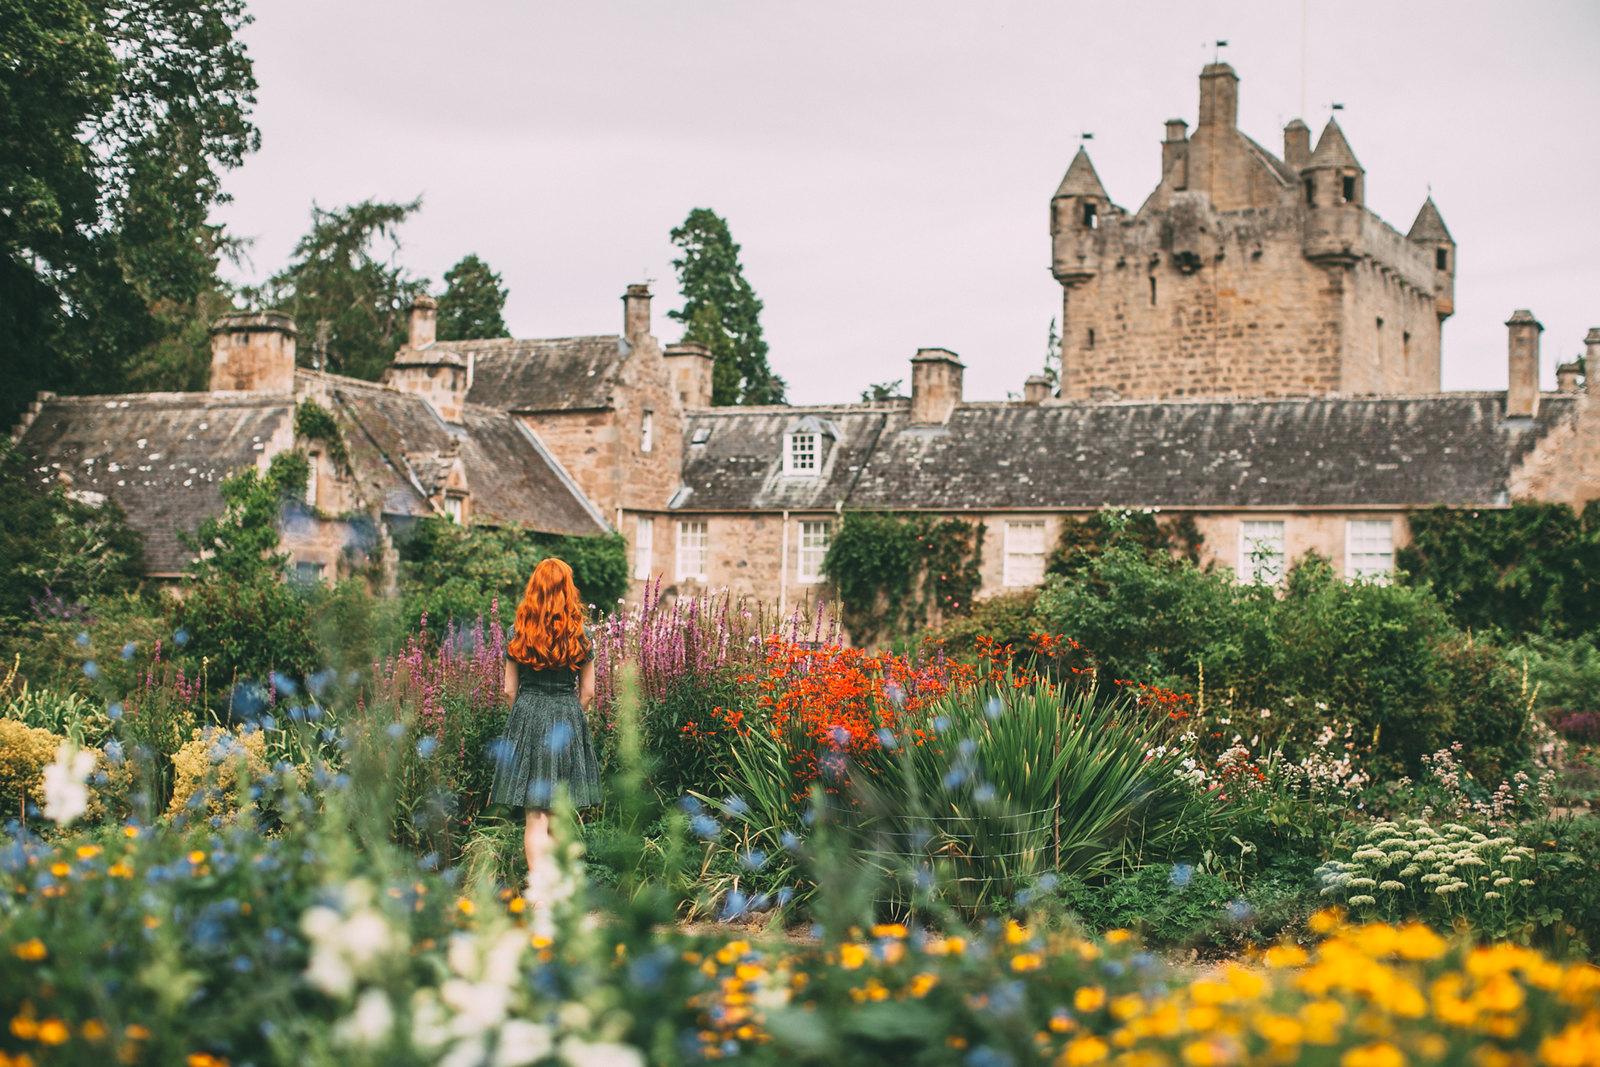 cawdor castle-1-2